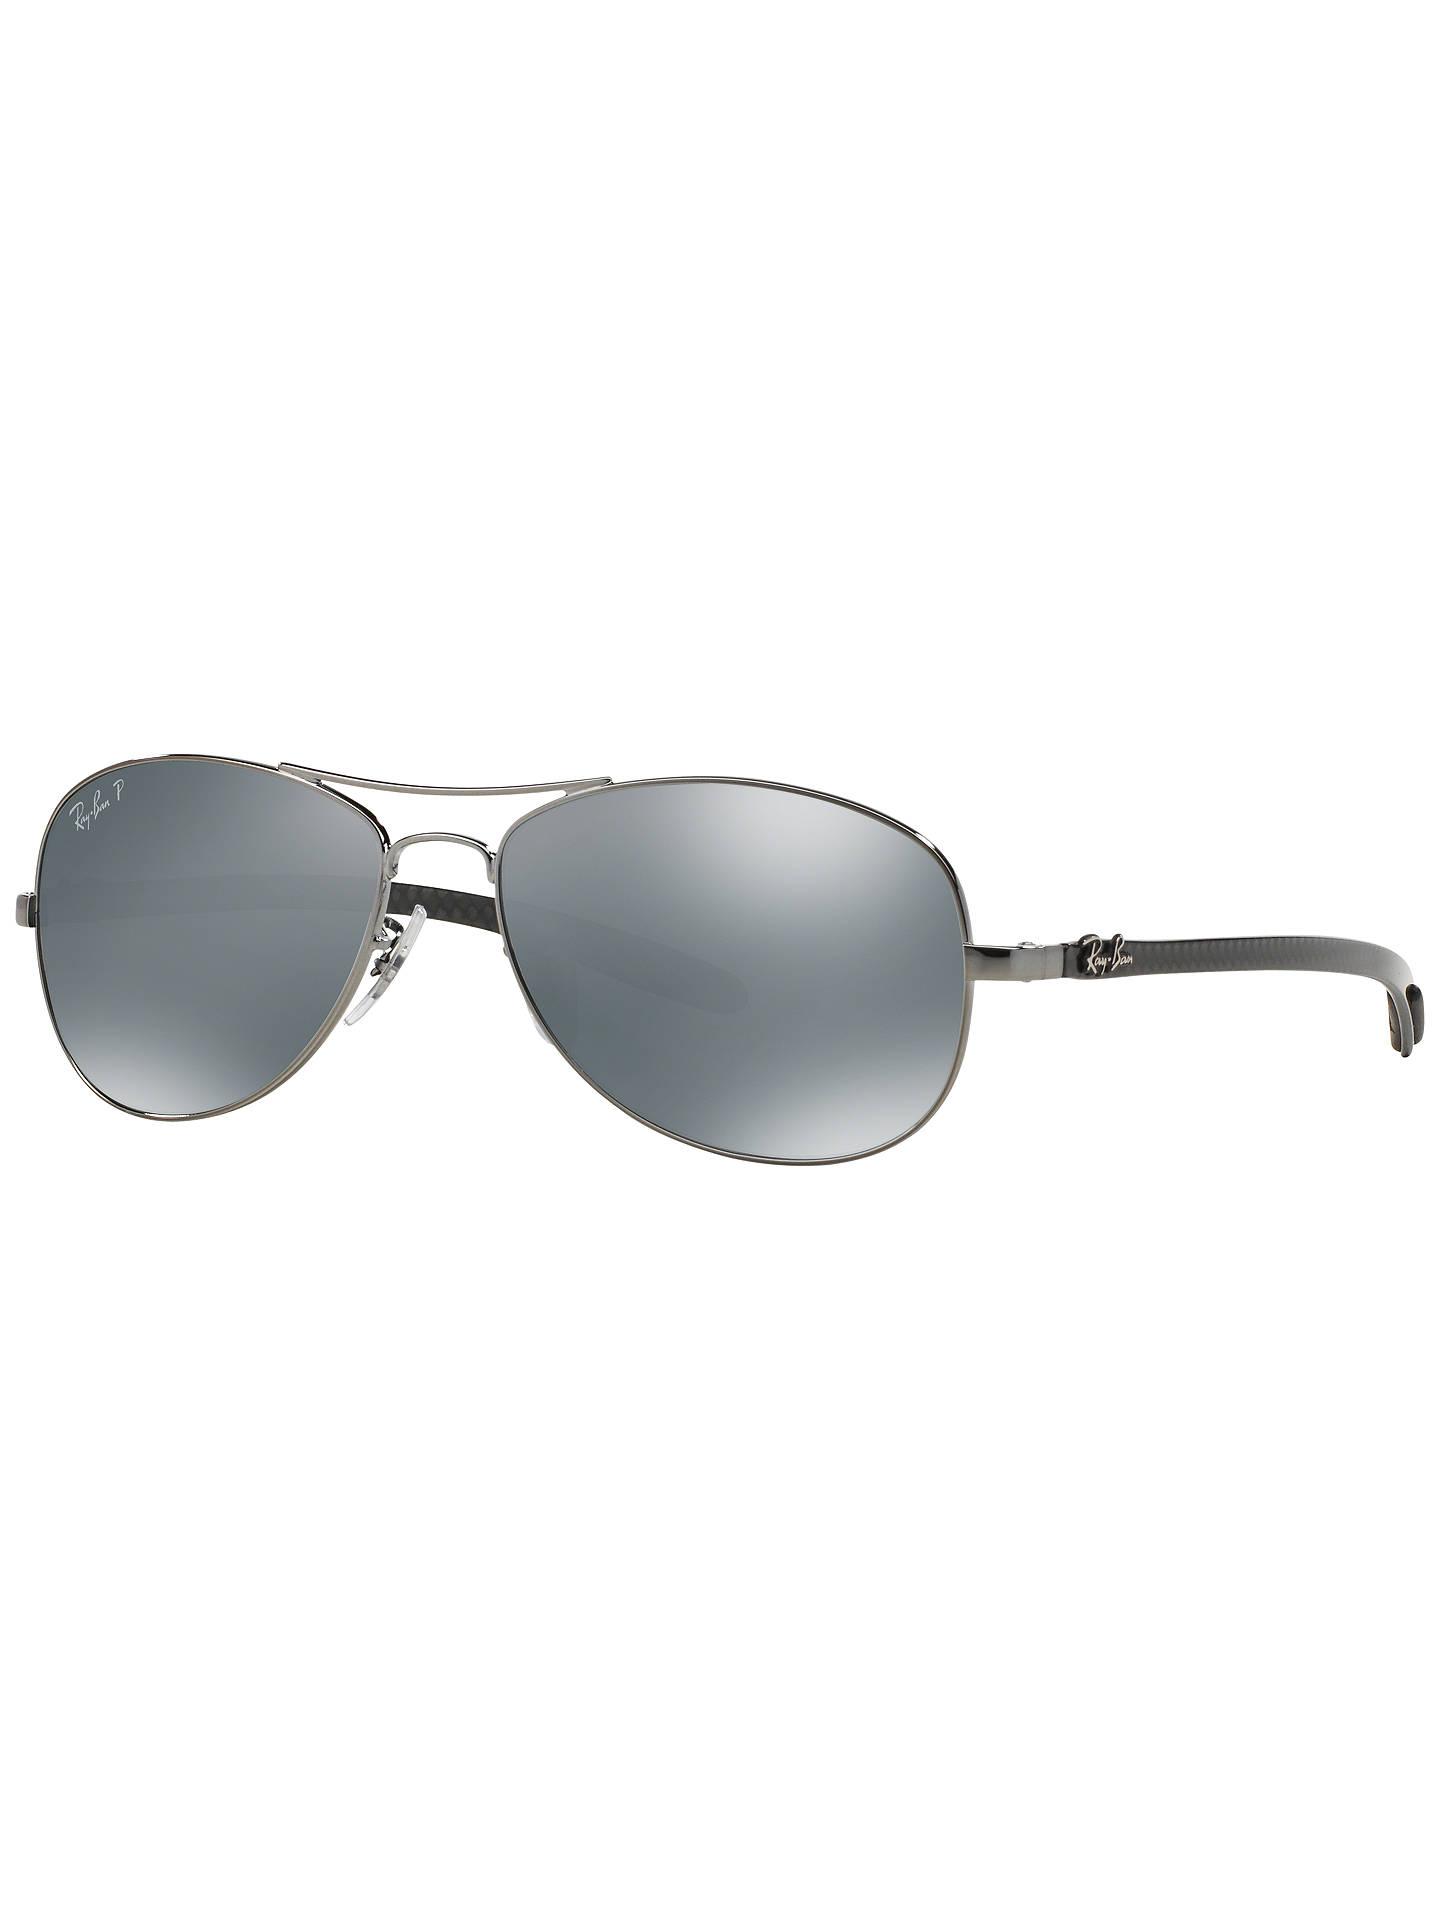 611fc4b7a6 Buy Ray-Ban RB8301 Polarised Carbon Fibre Pilot Sunglasses